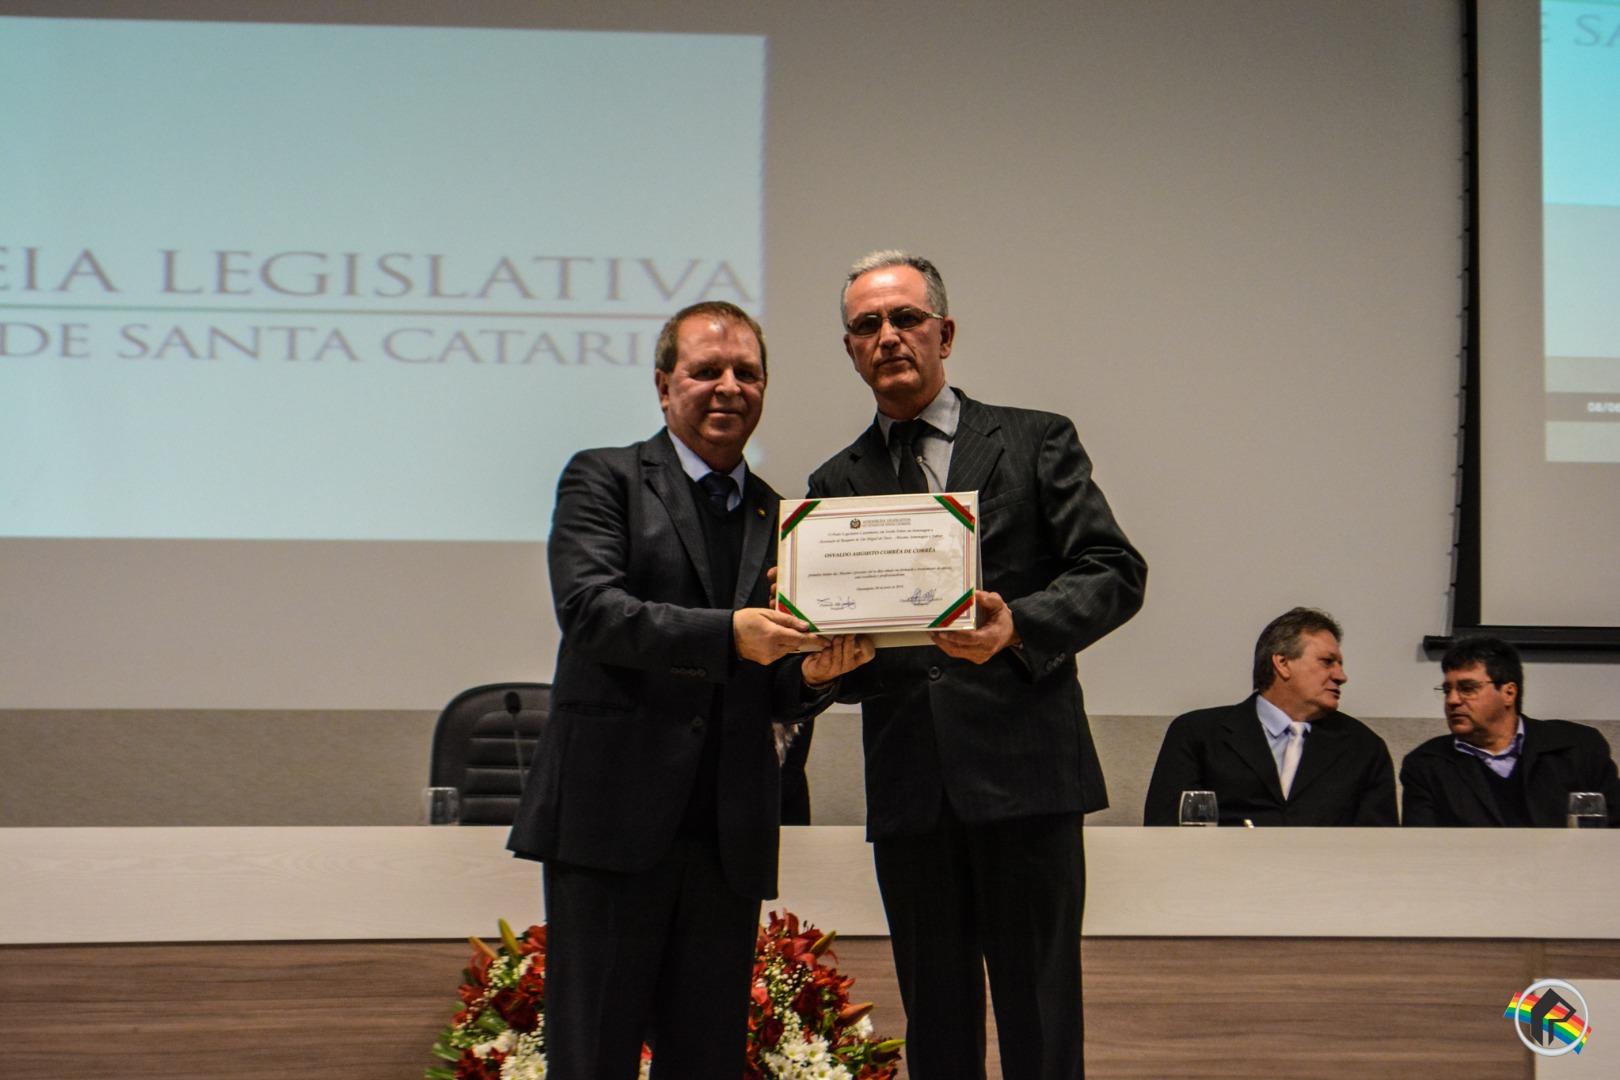 Abasmo é homenageada pela Assembleia Legislativa de Santa Catarina